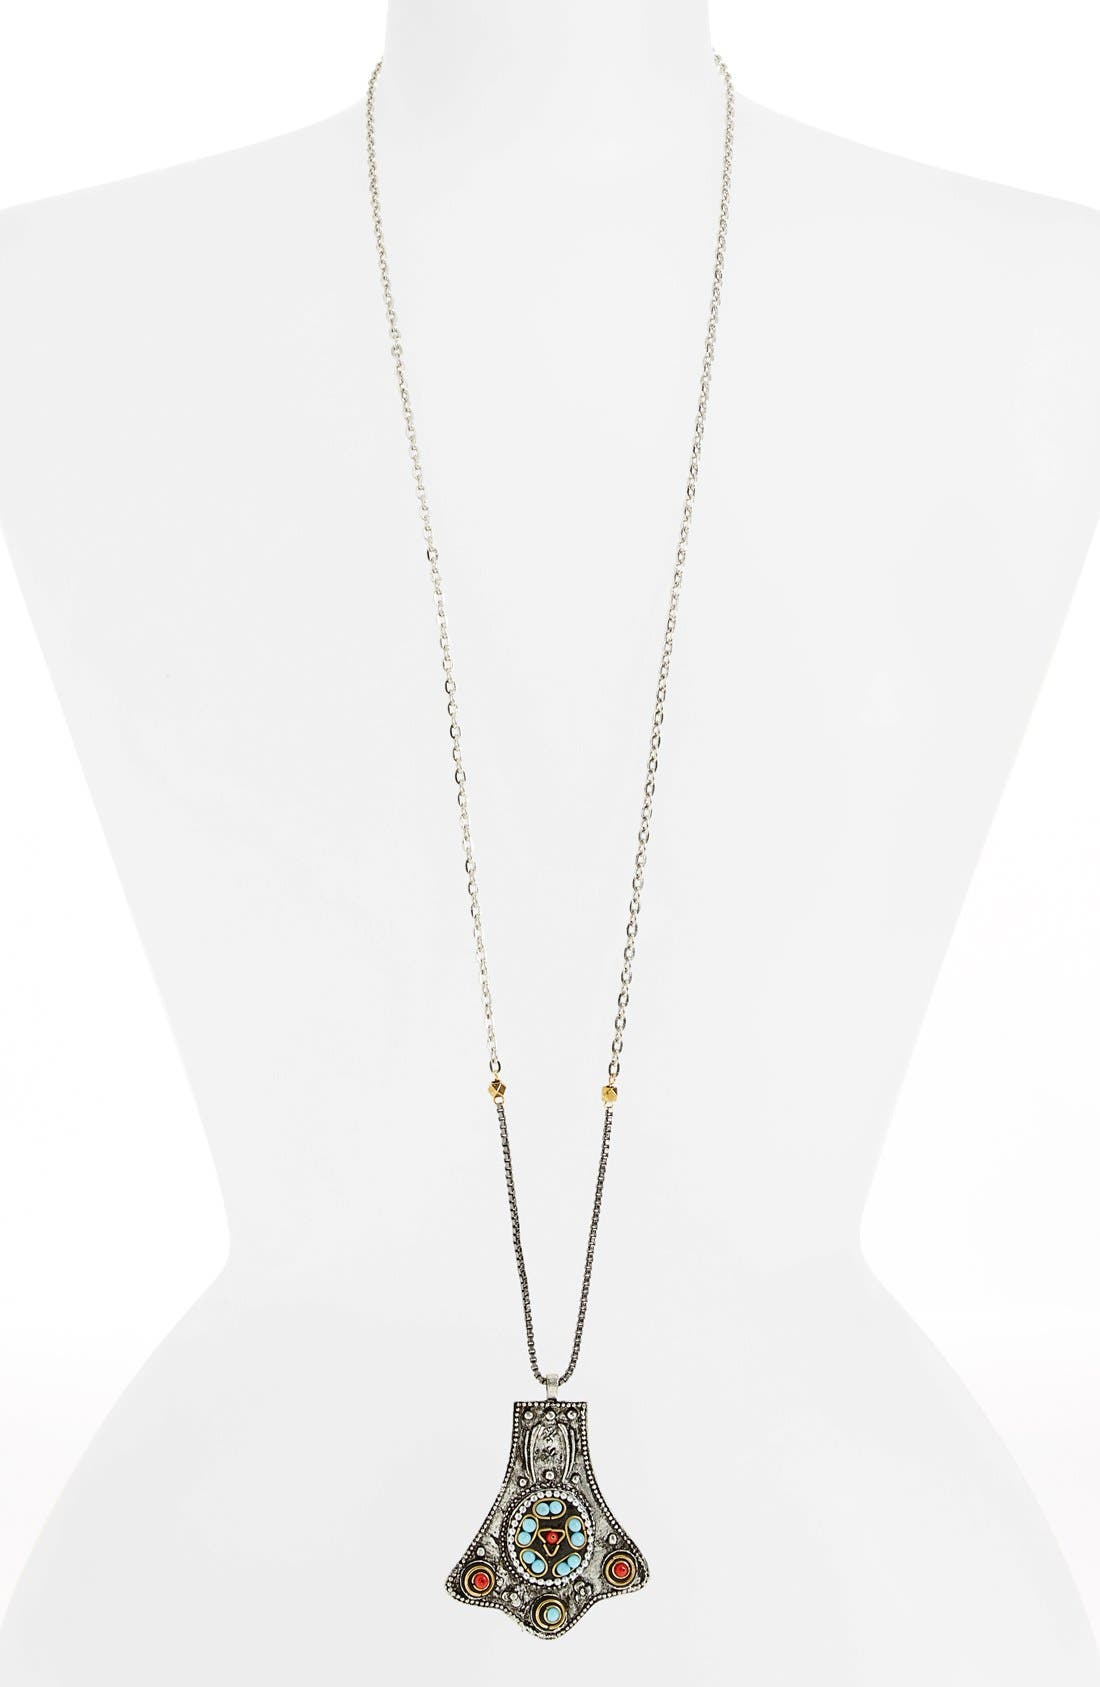 Alternate Image 1 Selected - Berry Embellished Pendant Necklace